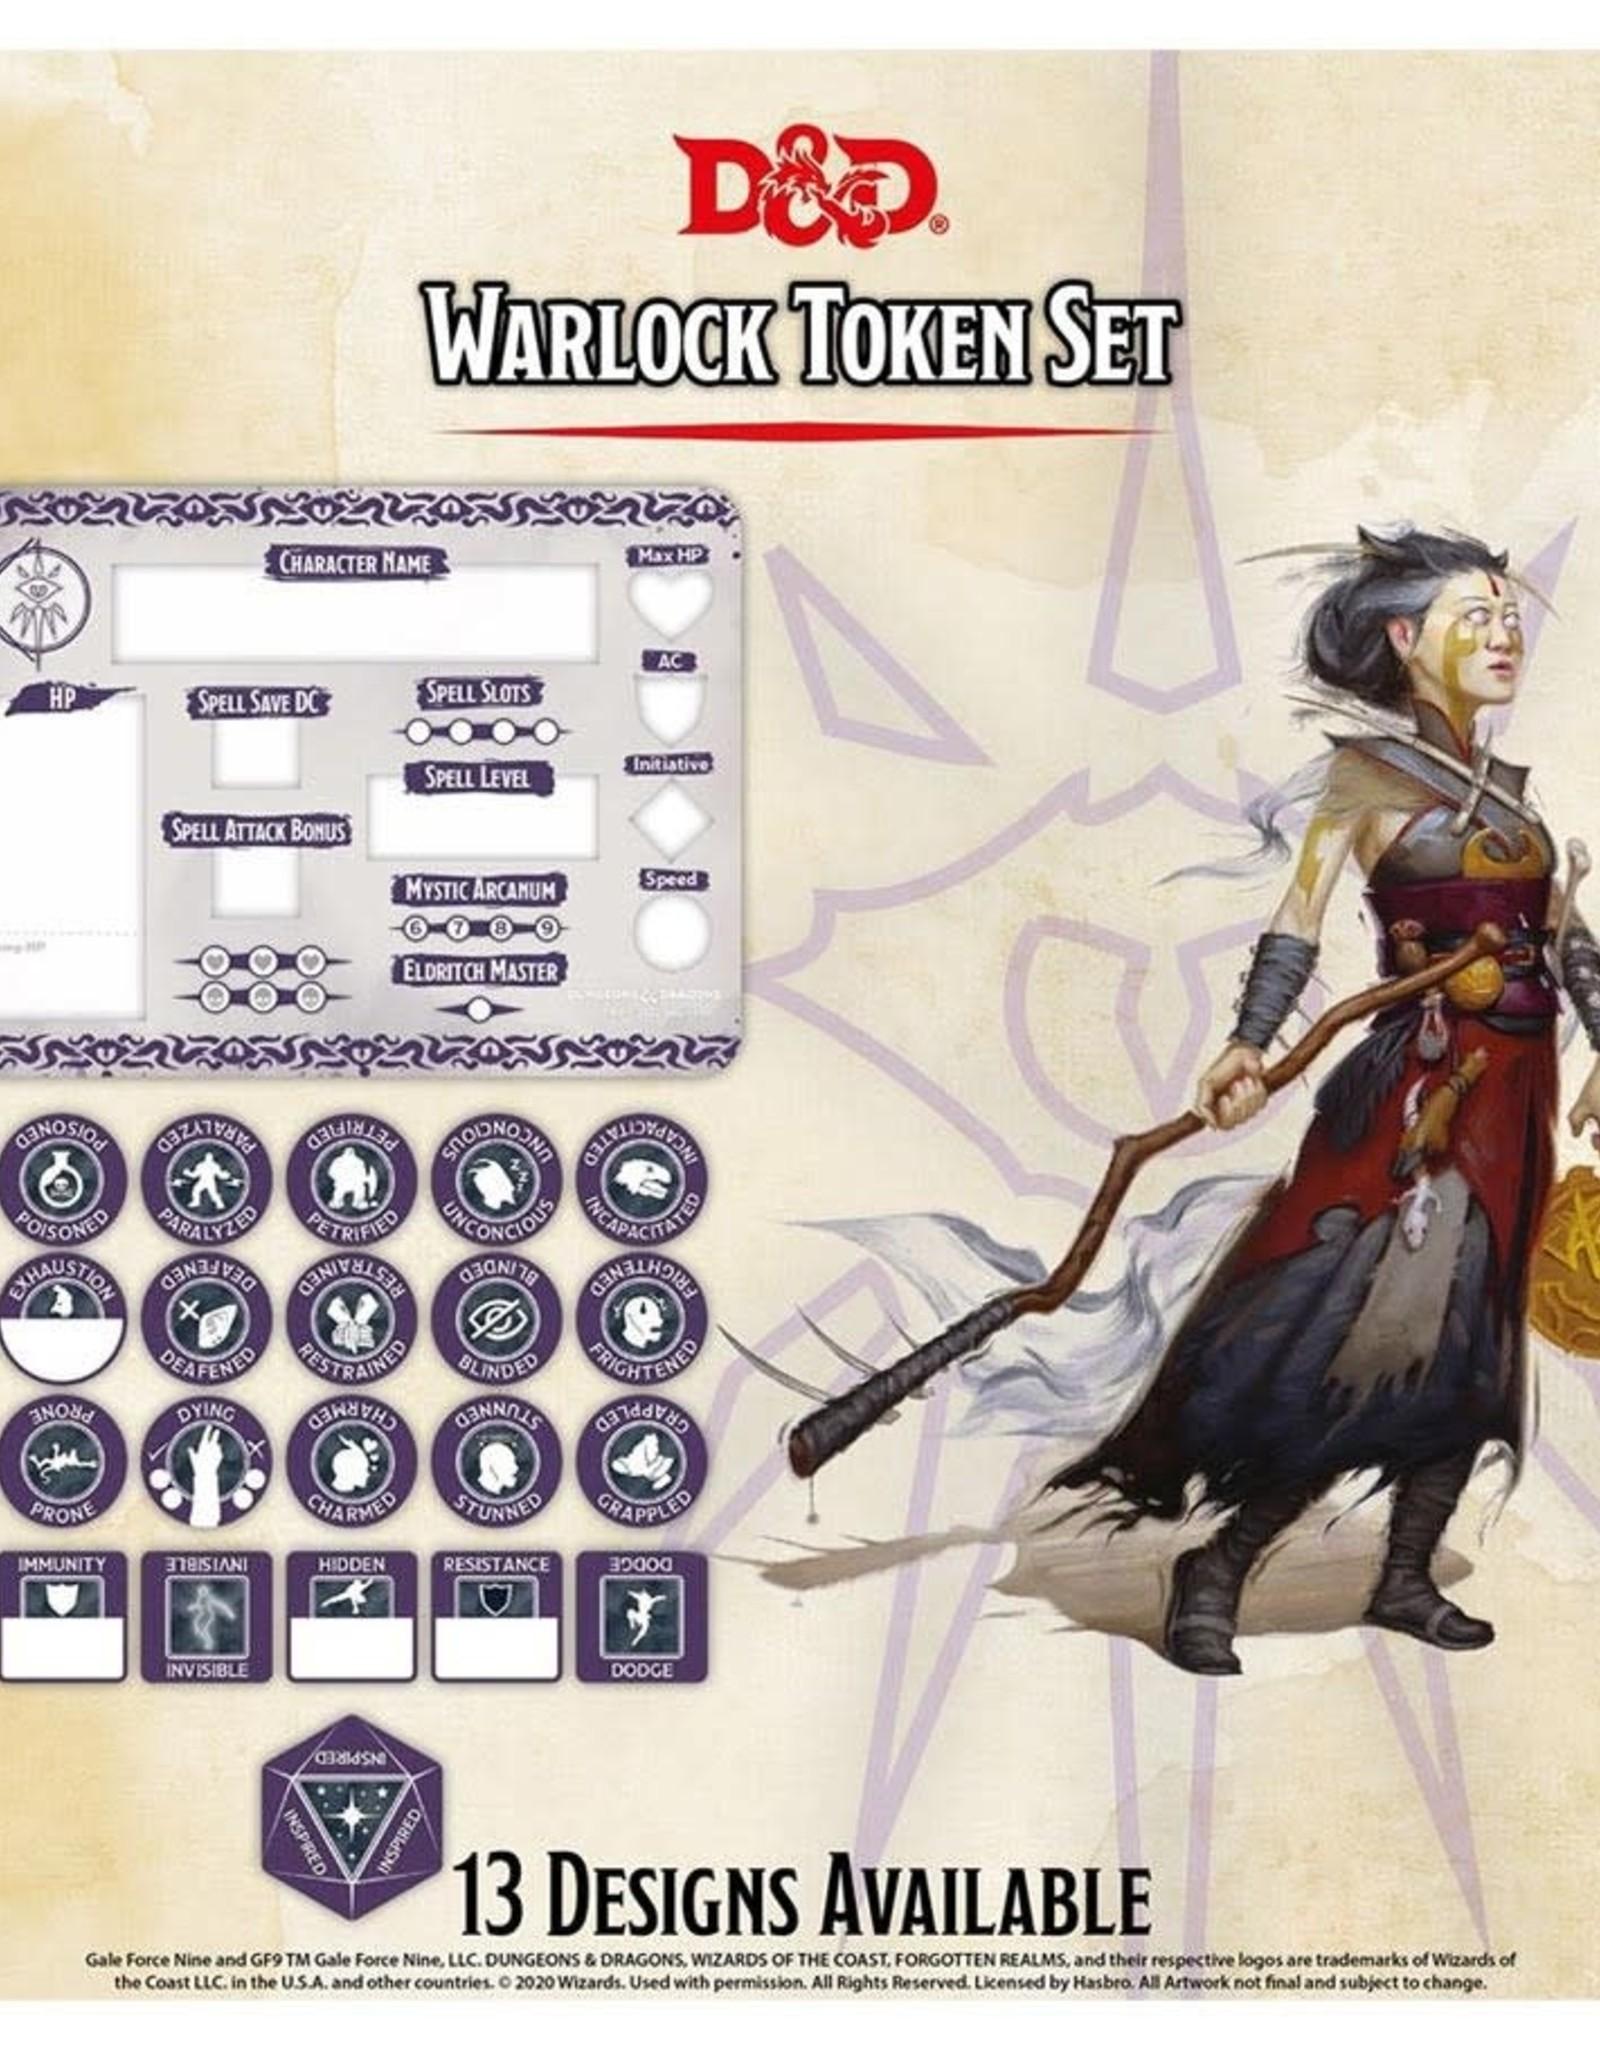 Gale Force 9 D&D RPG Token Set Warlock